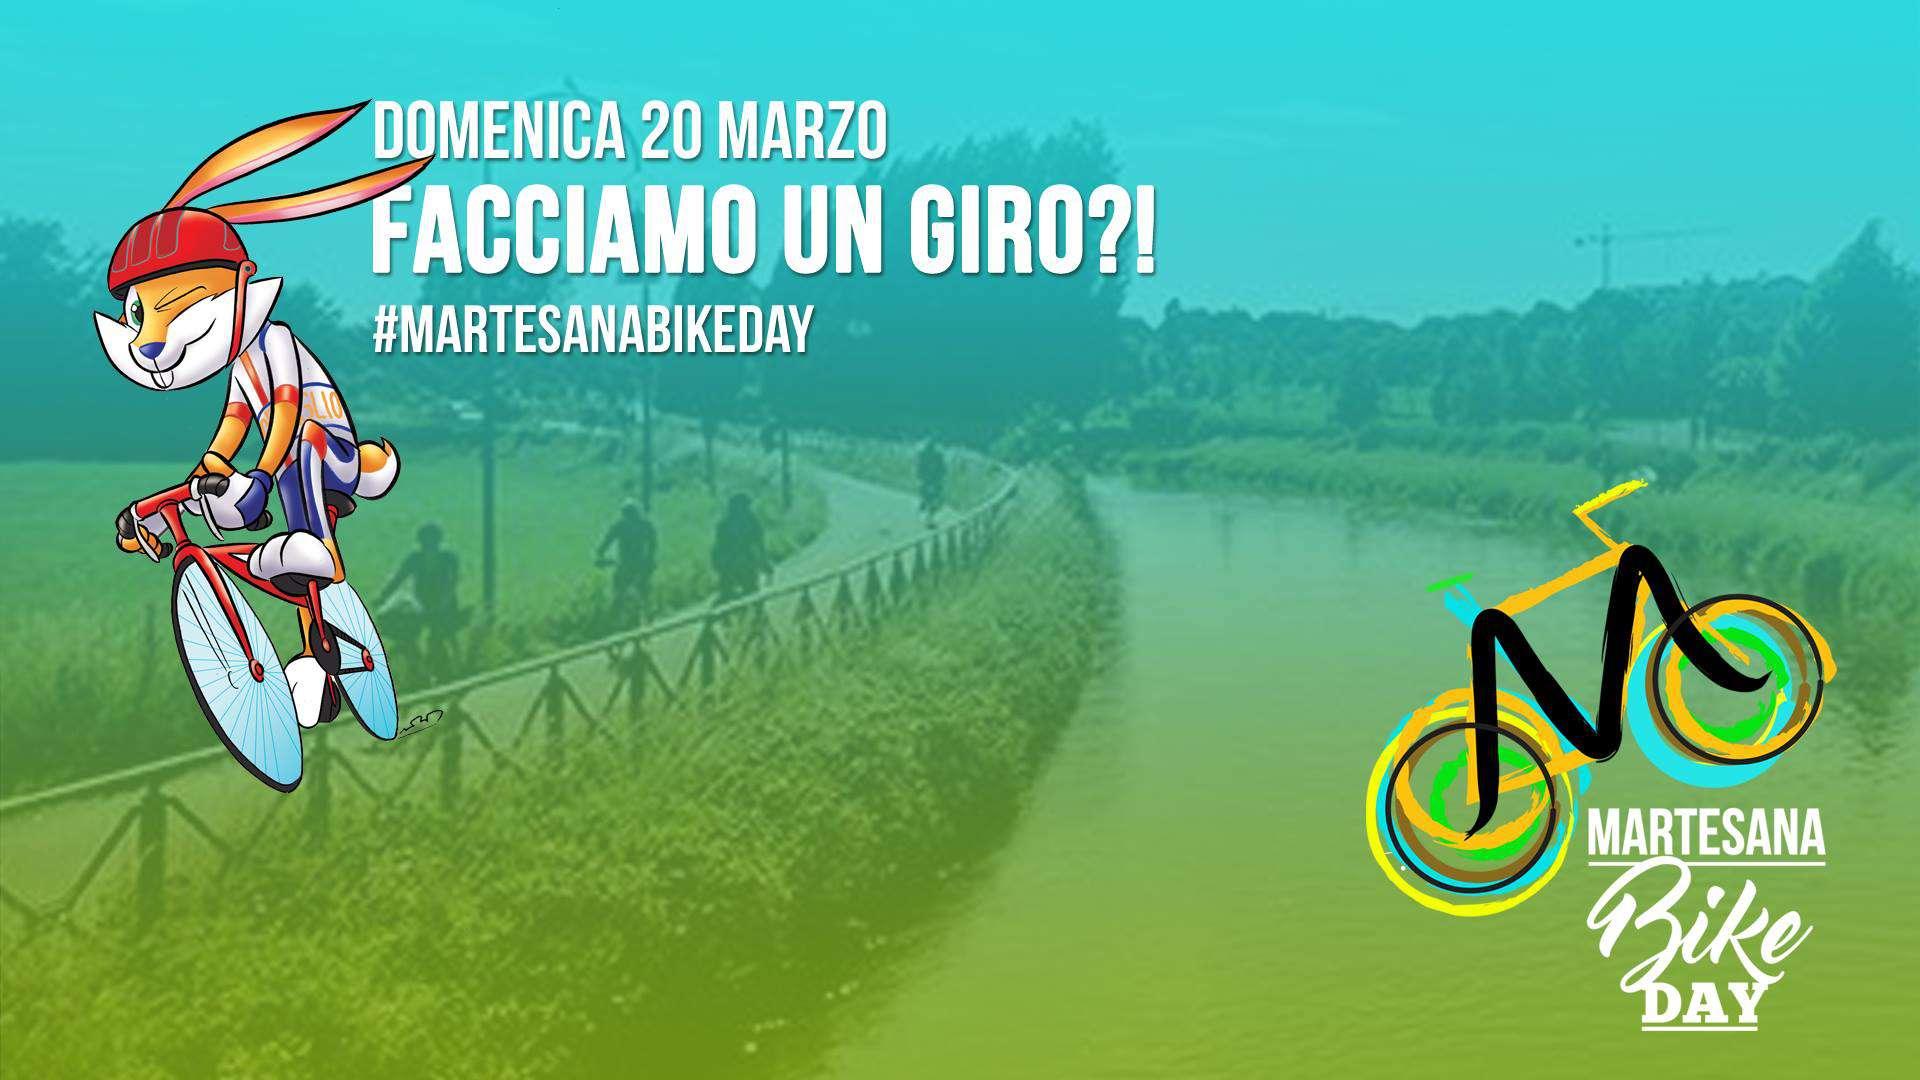 martesana bike day